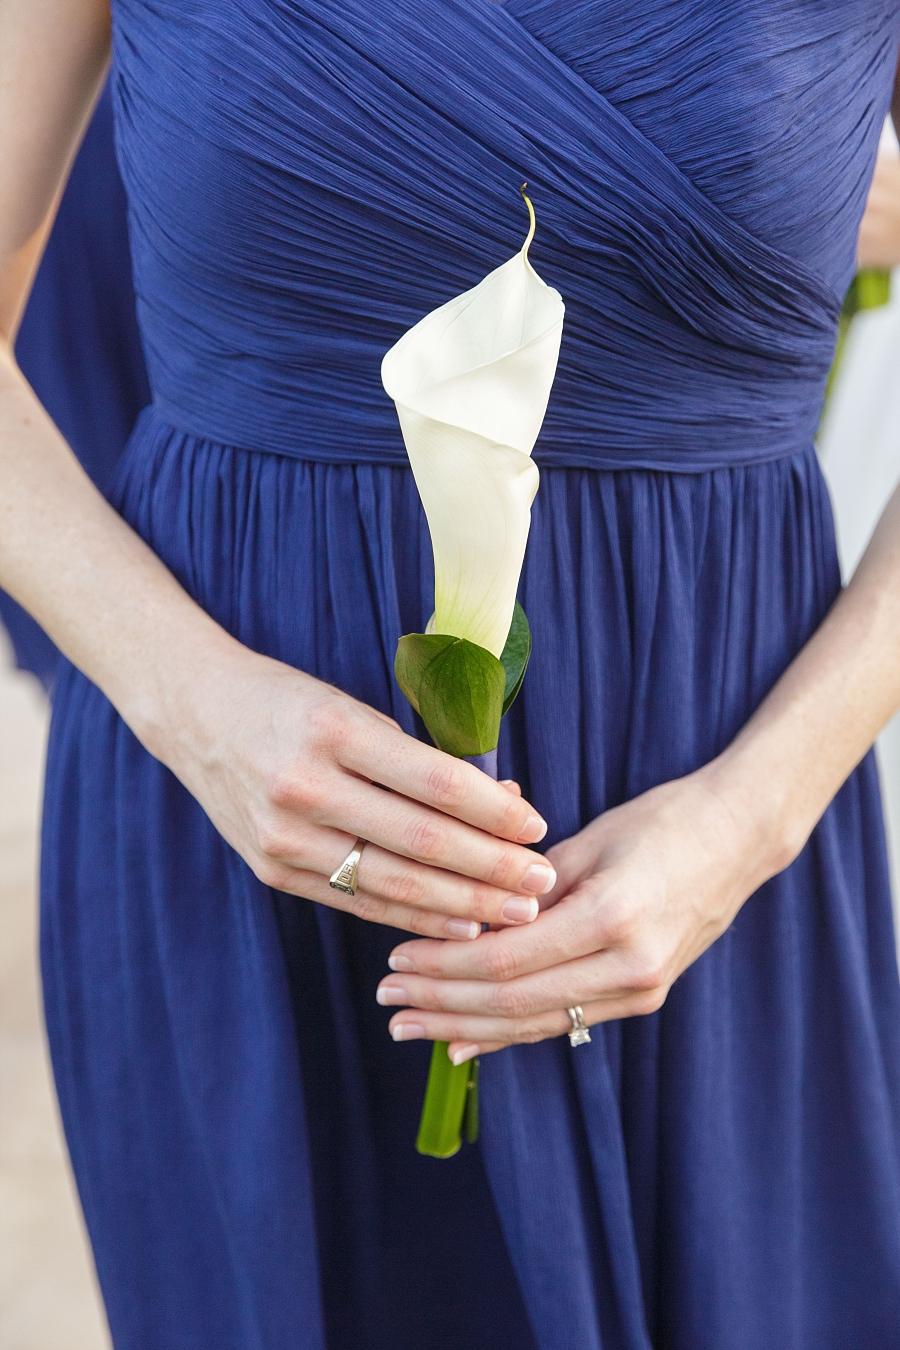 Stacy-Anderson-Photography-McGovern-Centennial-Gardens-Houston-Wedding-Photographer_0047.jpg